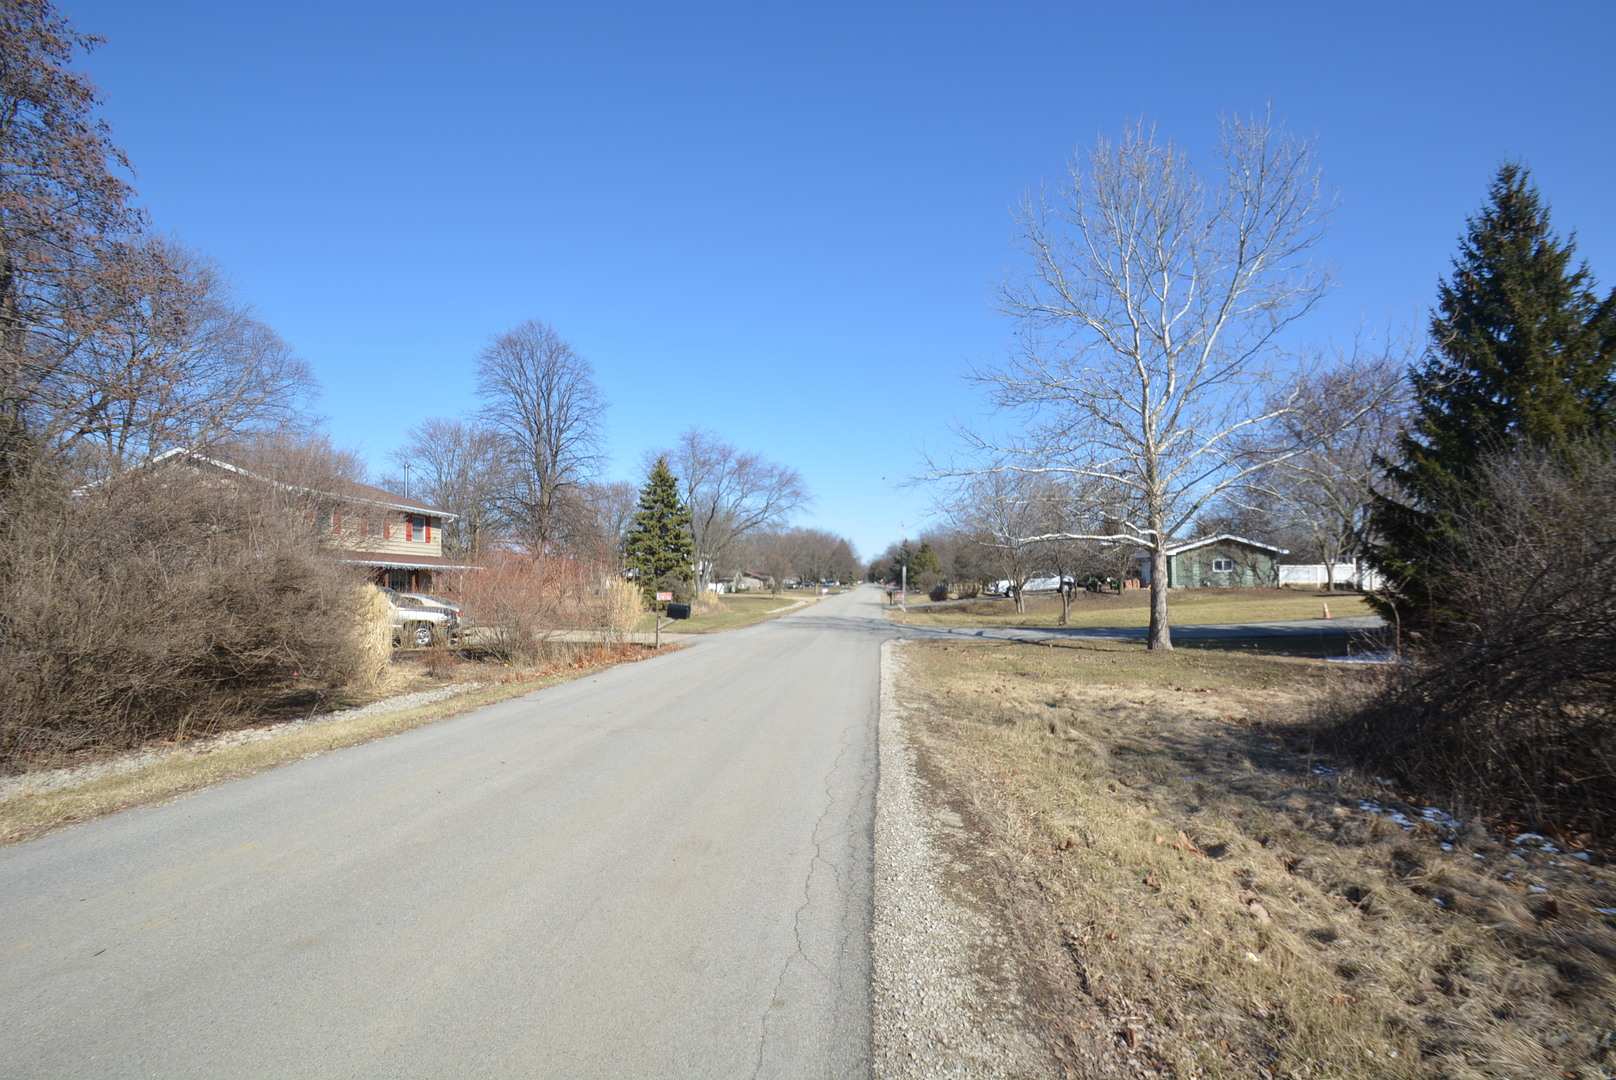 21w783 Parkside Avenue, Addison, IL - USA (photo 3)